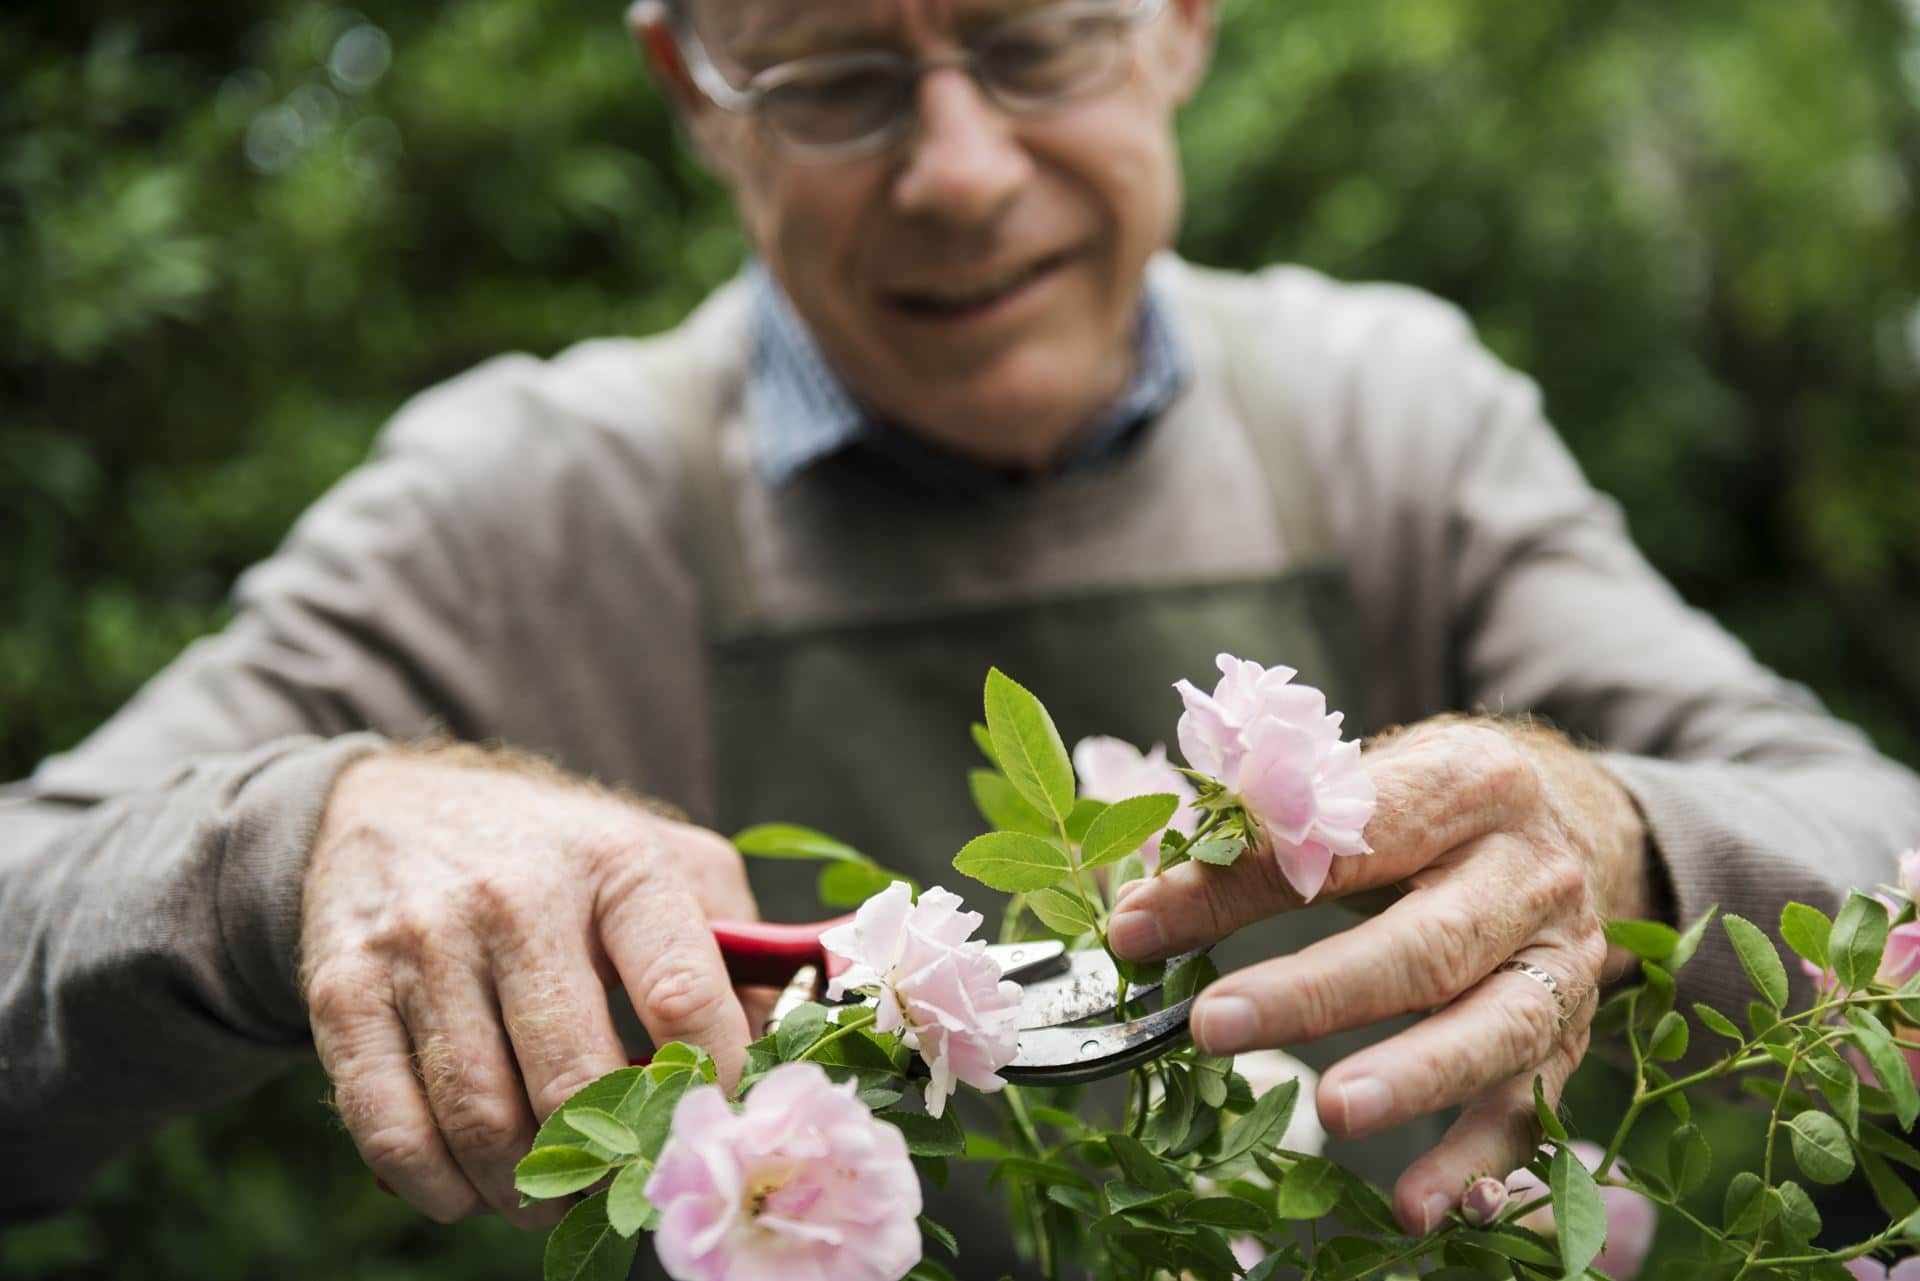 ריפוי בעיסוק כרמיאל - Restart Therapy ריפוי בעיסוק למבוגרים